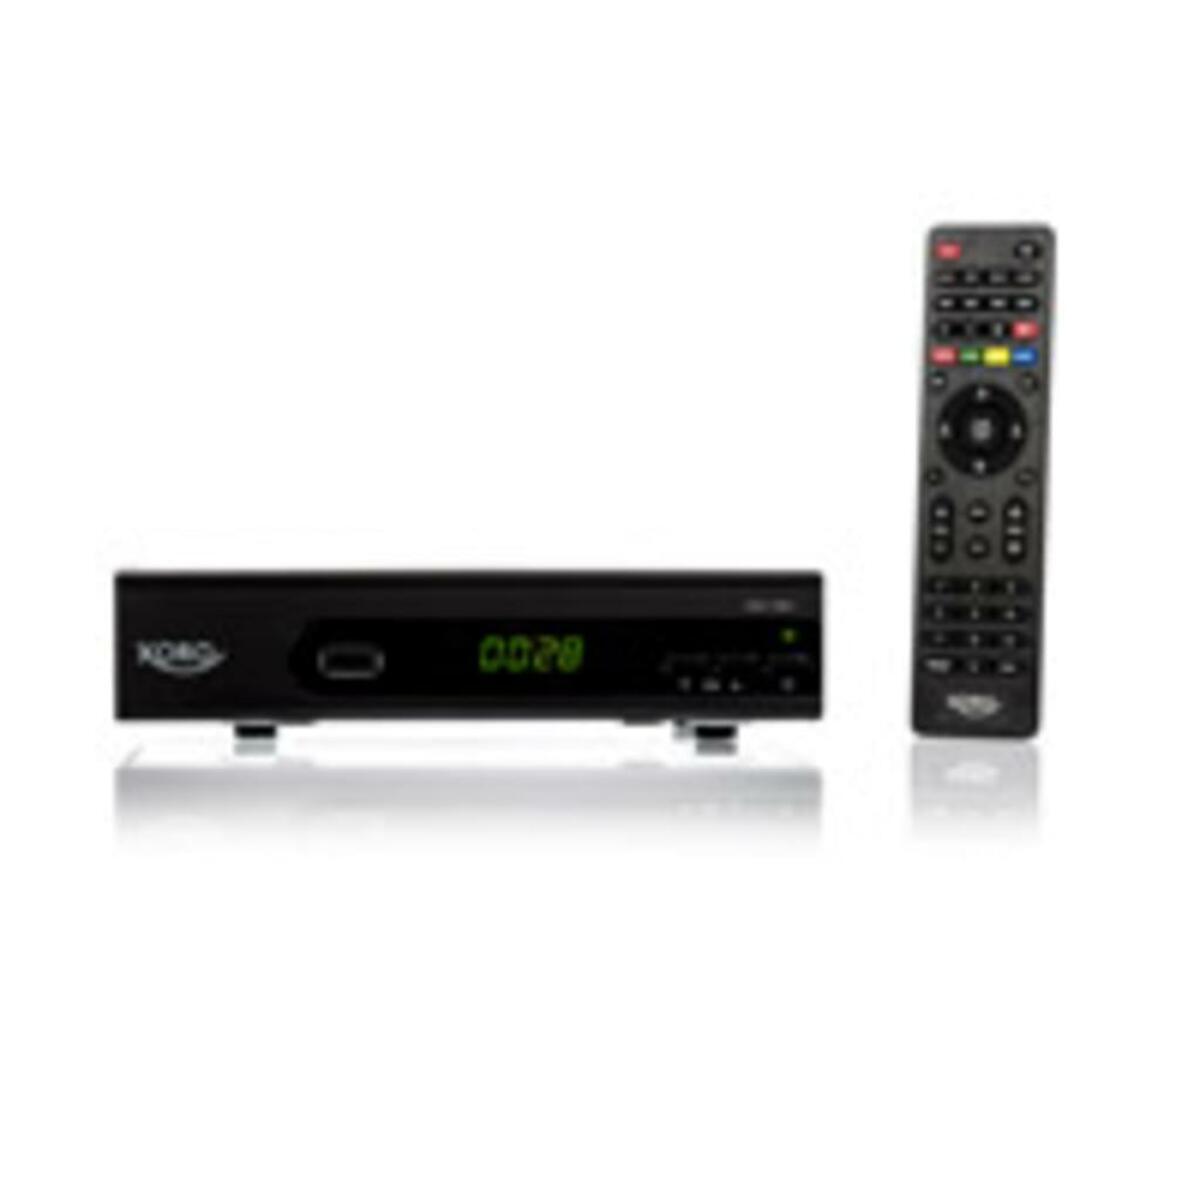 Bild 3 von XORO HD DVB-C Receiver HRK 7660, H.264 HDTV, MPEG-4 AVC/AVCHD, Farbe: Schwarz